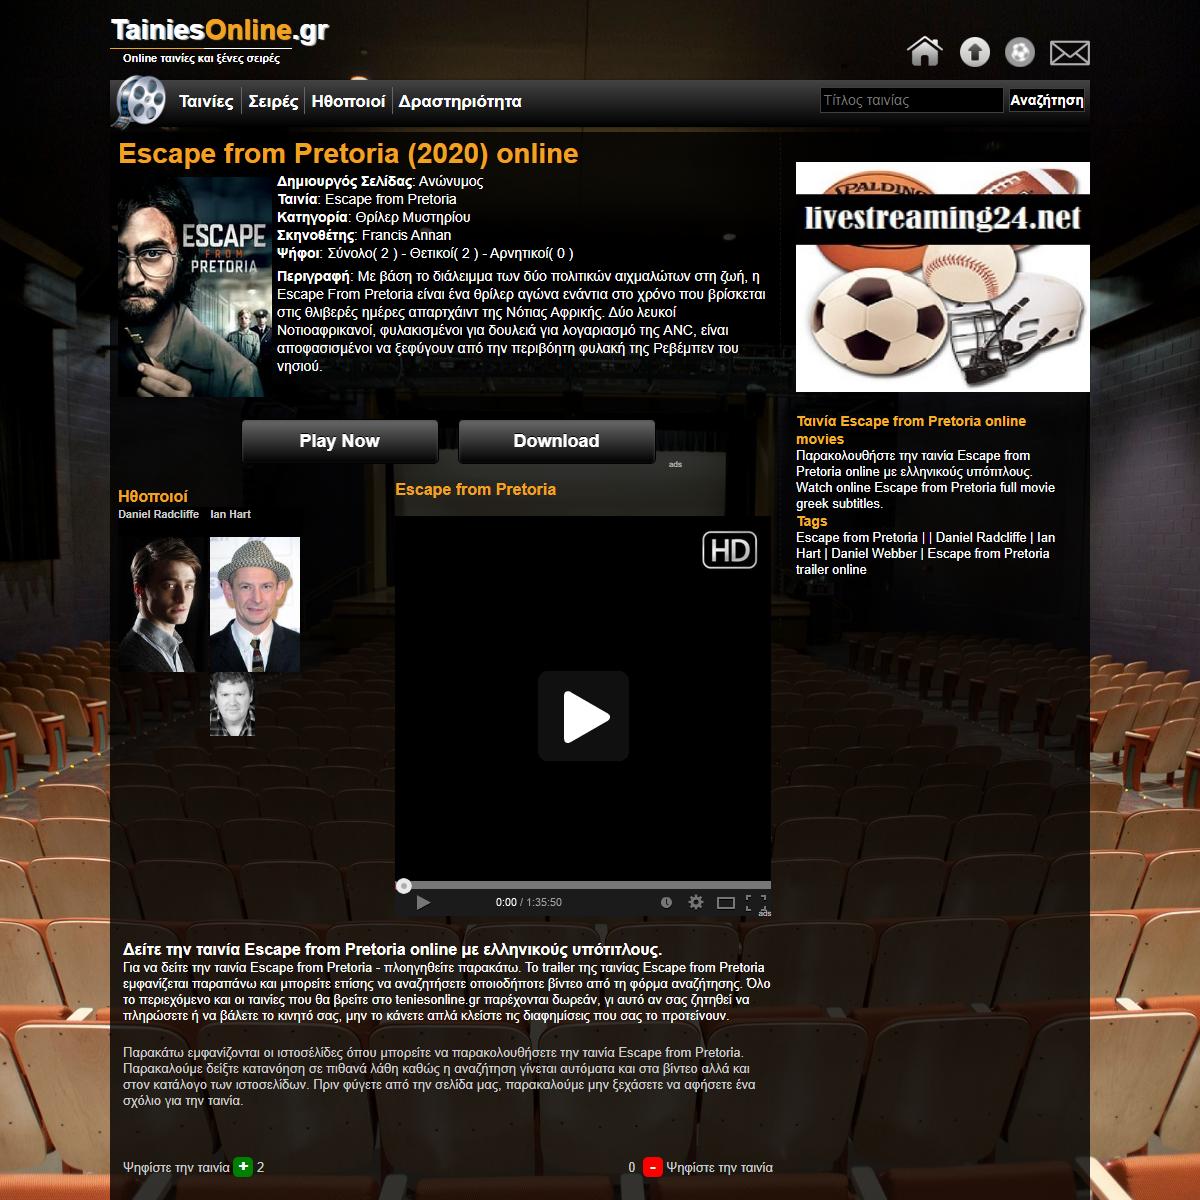 ESCAPE FROM PRETORIA online movies GREEK SUBS